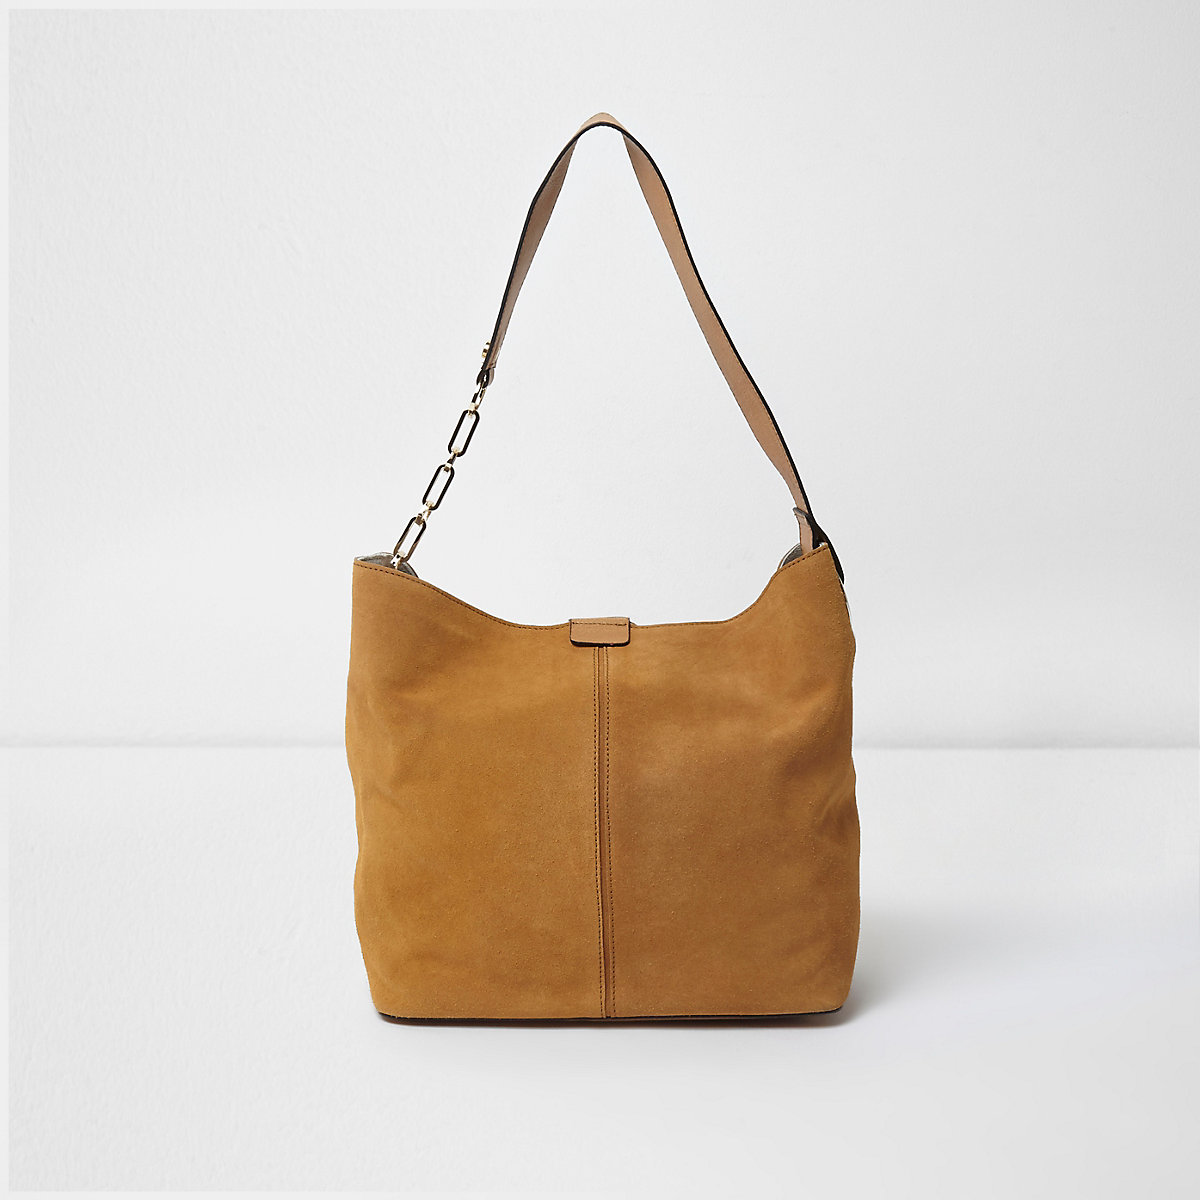 6e493dad930b Tan suede underarm slouch chain bag - Shoulder Bags - Bags   Purses - women